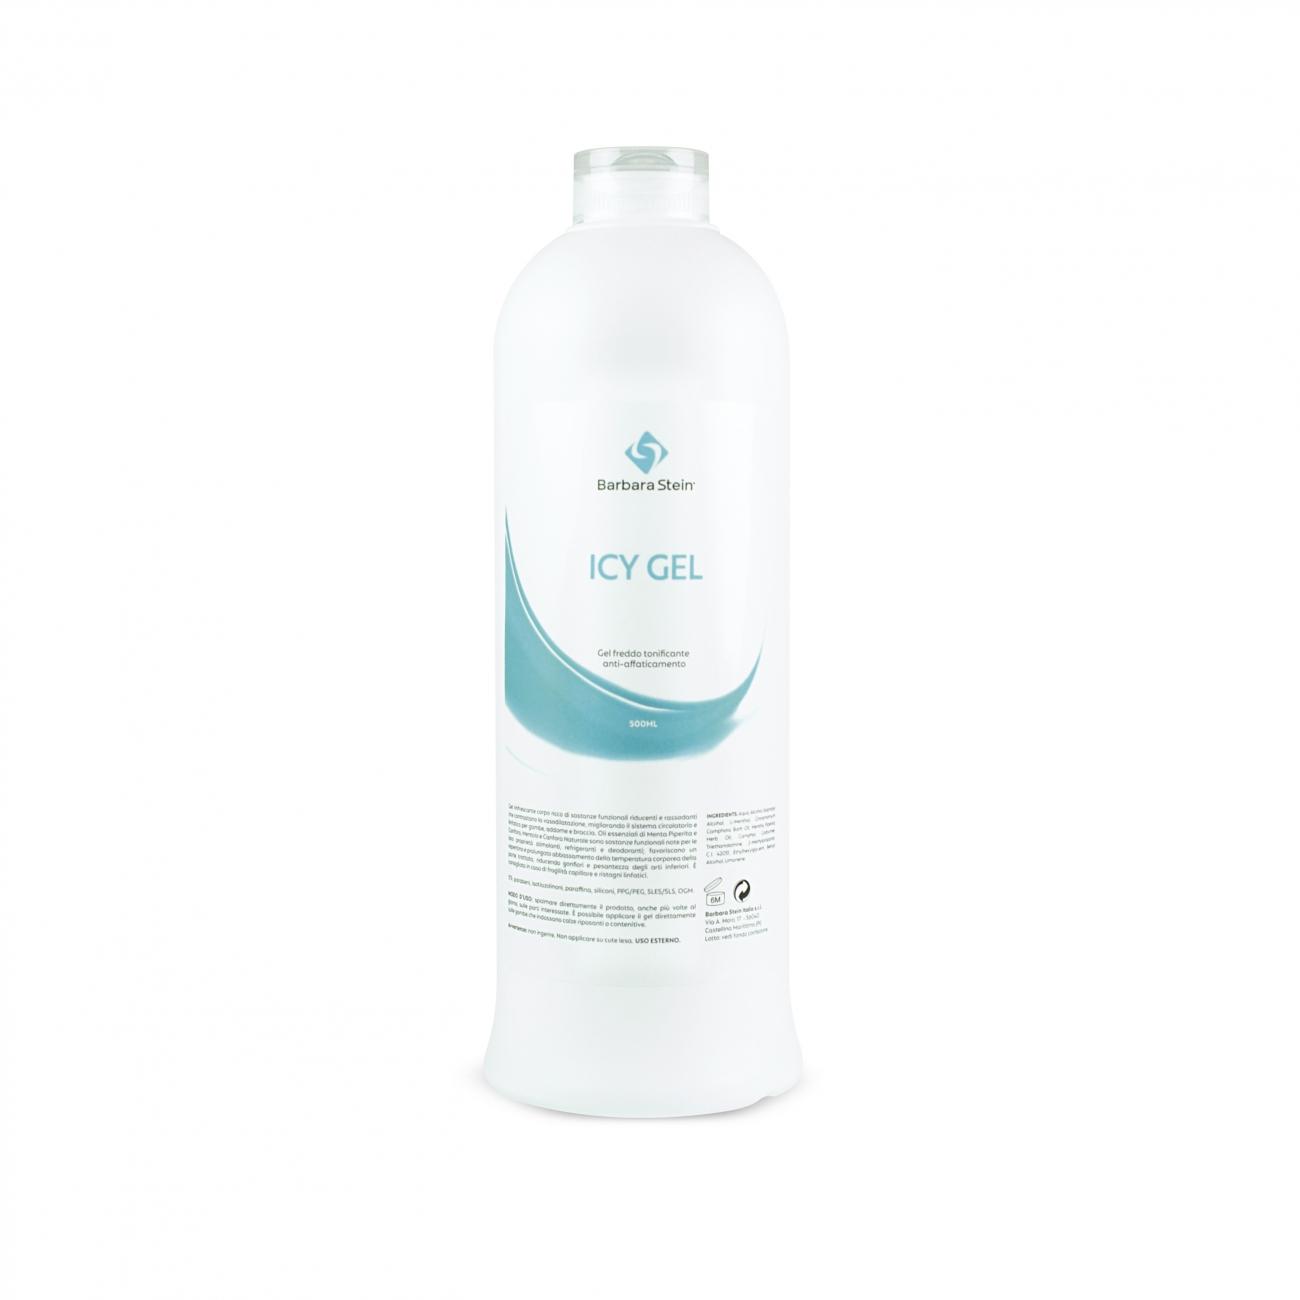 ICY GEL (500 ml)